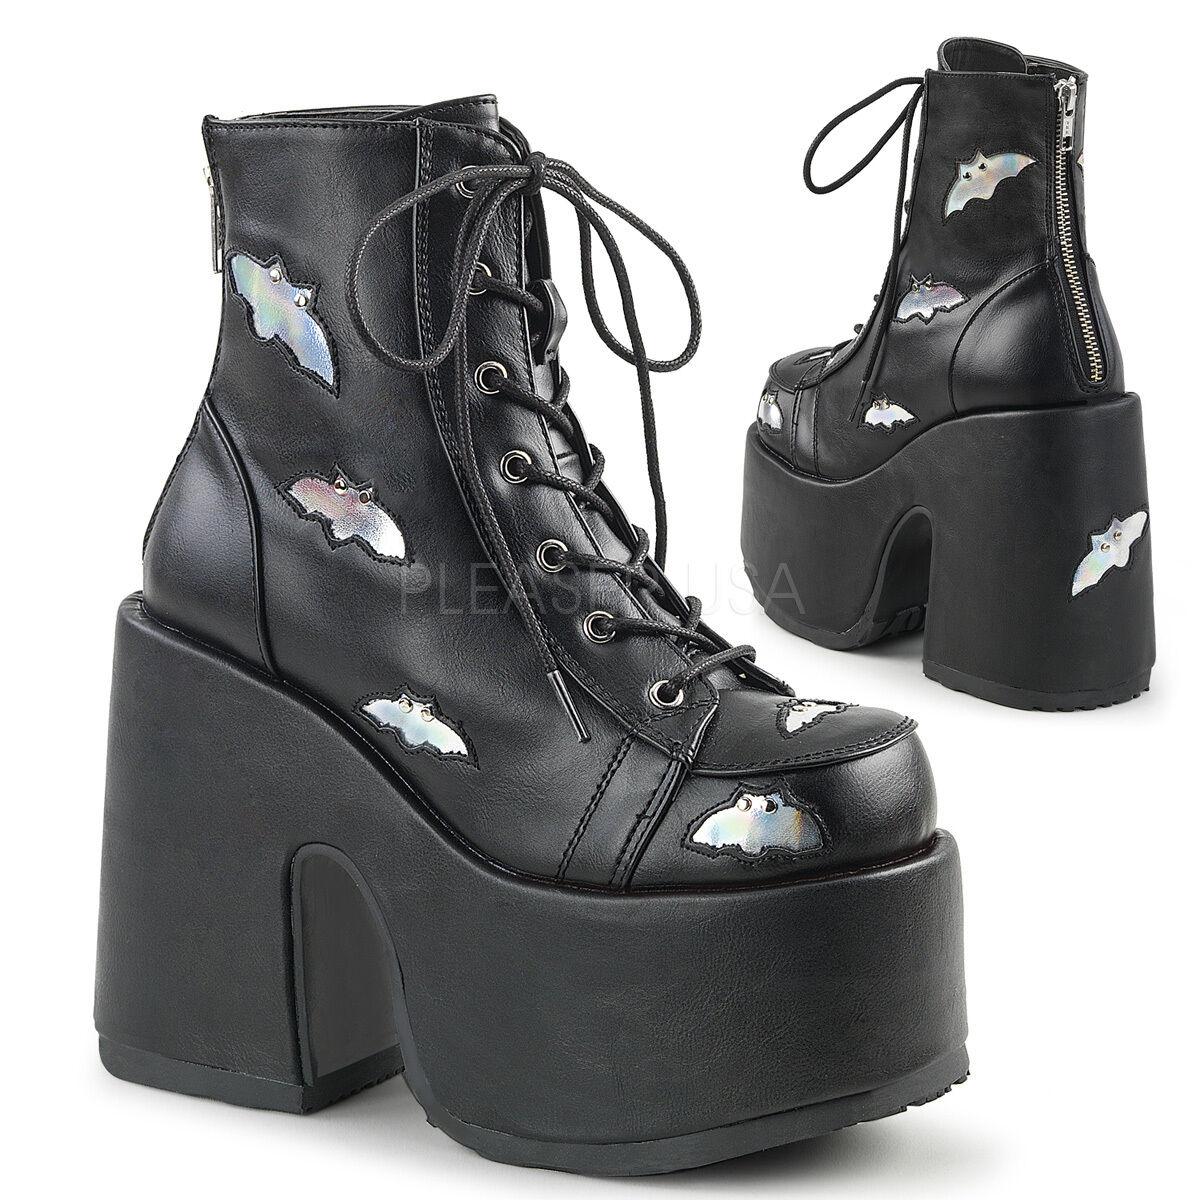 Demonia 5  Grueso Talón Negro botas 8 al tobillo con bates de plata 6 7 8 botas 9 10 11 12 13 14 cd5581